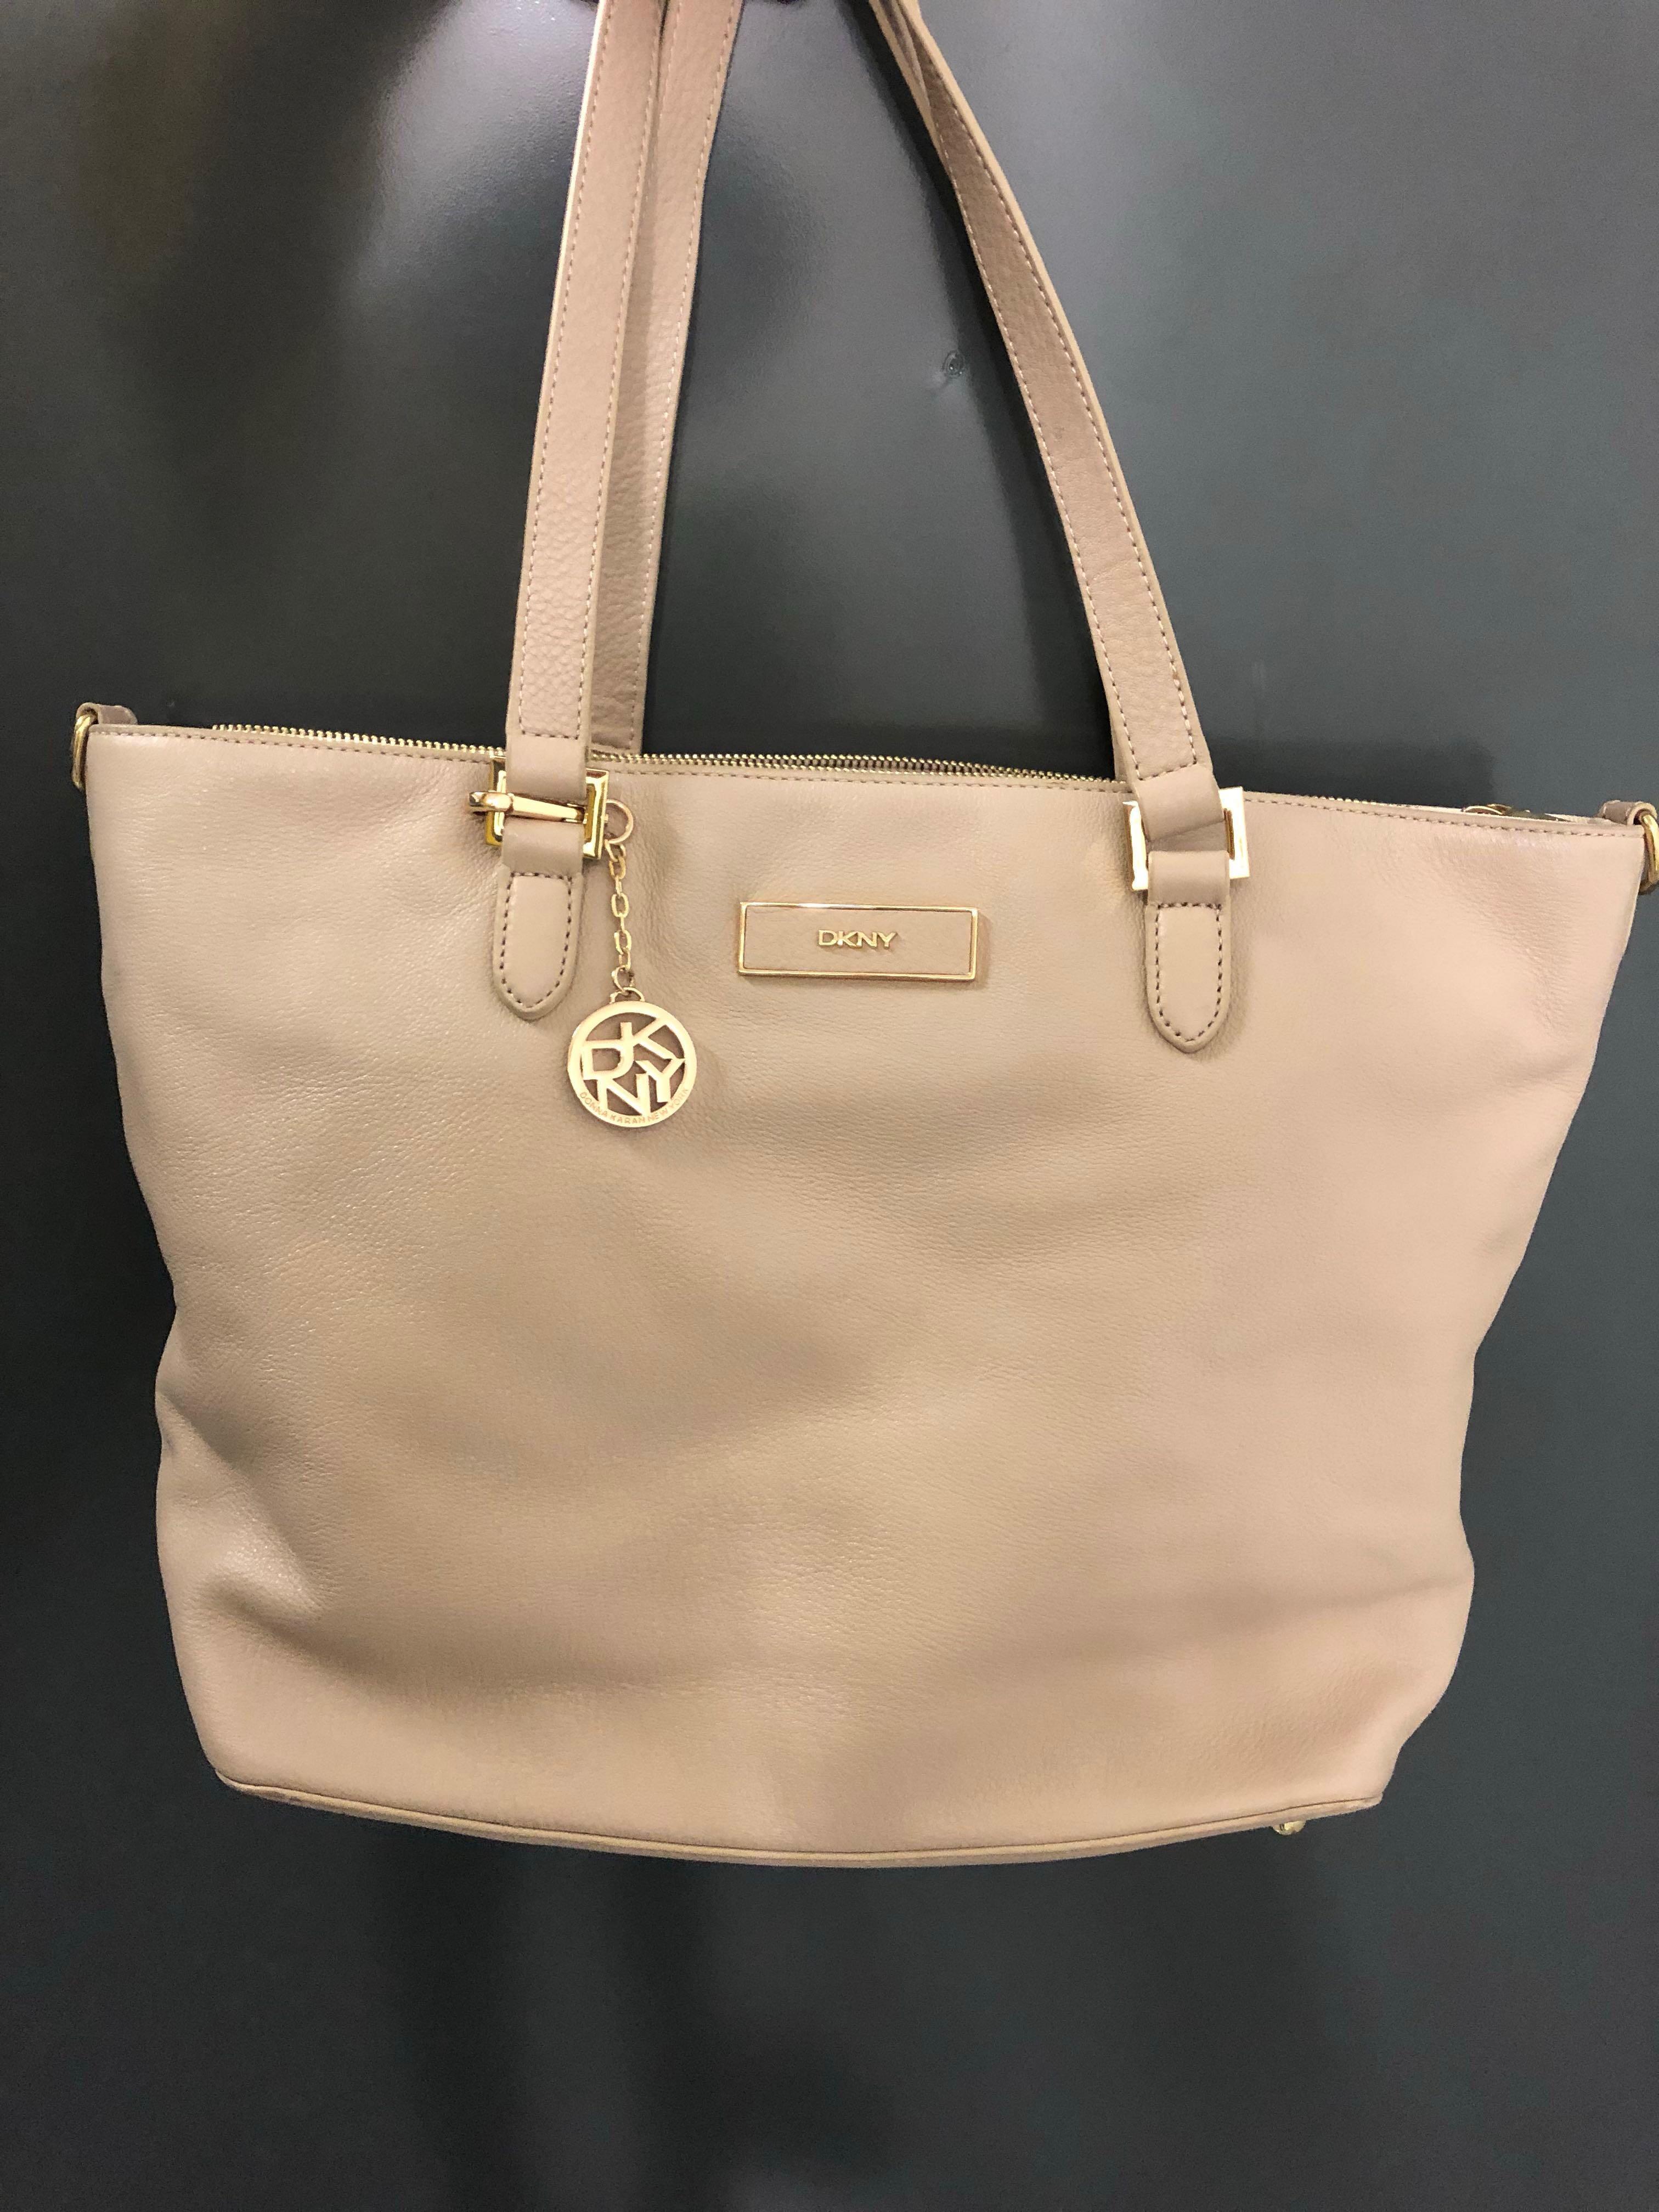 DKNY White/Cream/Beige handbag with chain detail